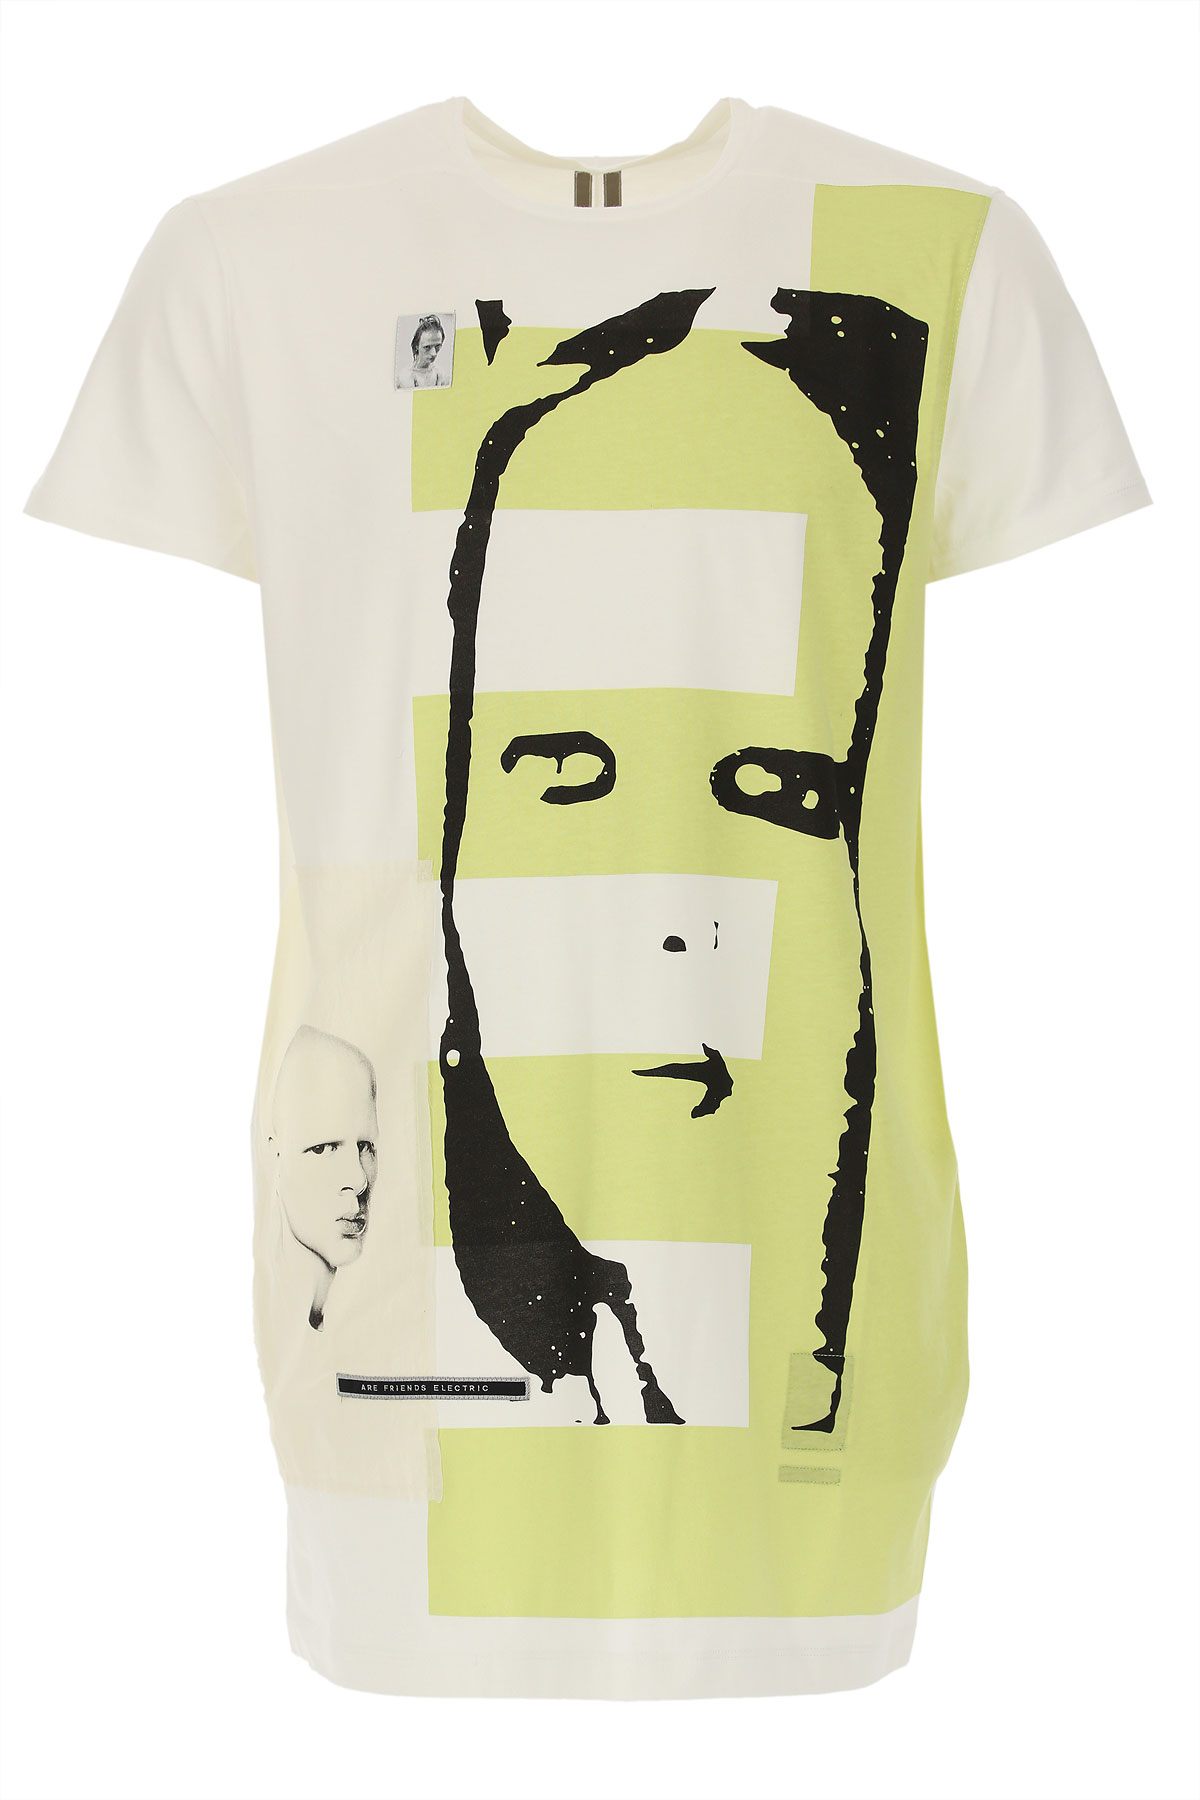 Rick Owens DRKSHDW T-Shirt for Men On Sale in Outlet, Black, Cotton, 2019, L M S